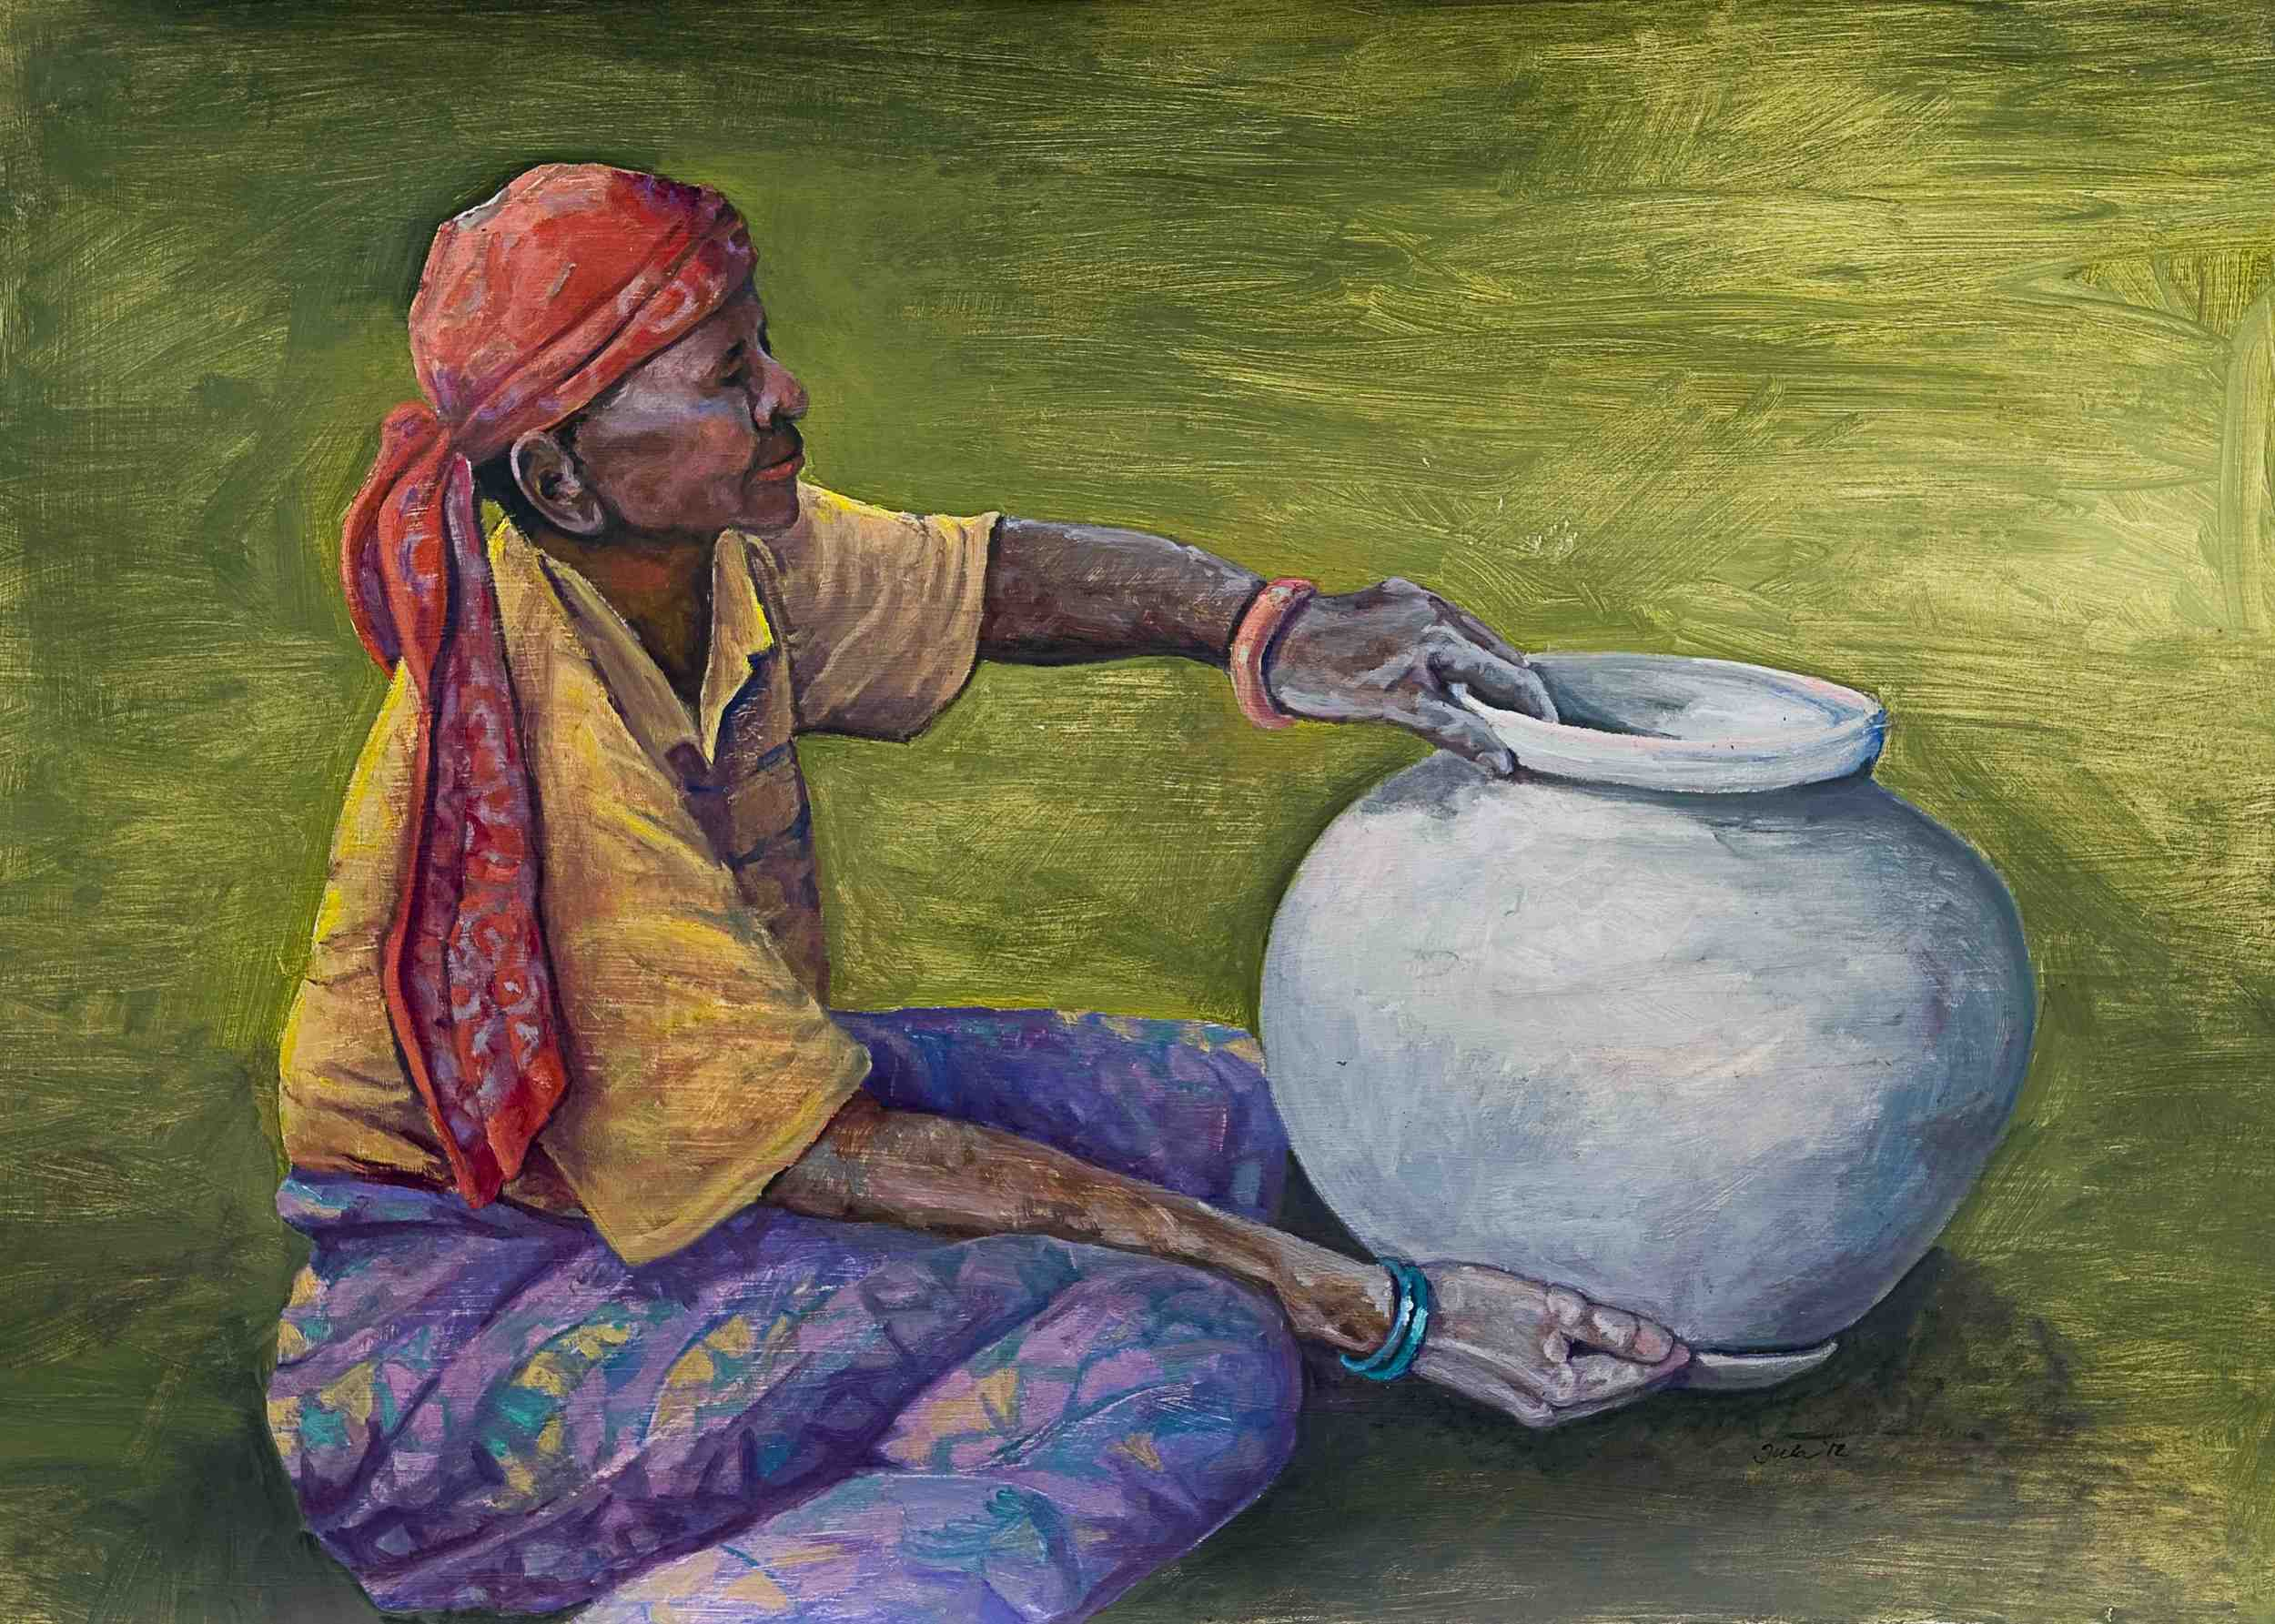 Batwa Potter-Copyright 2012